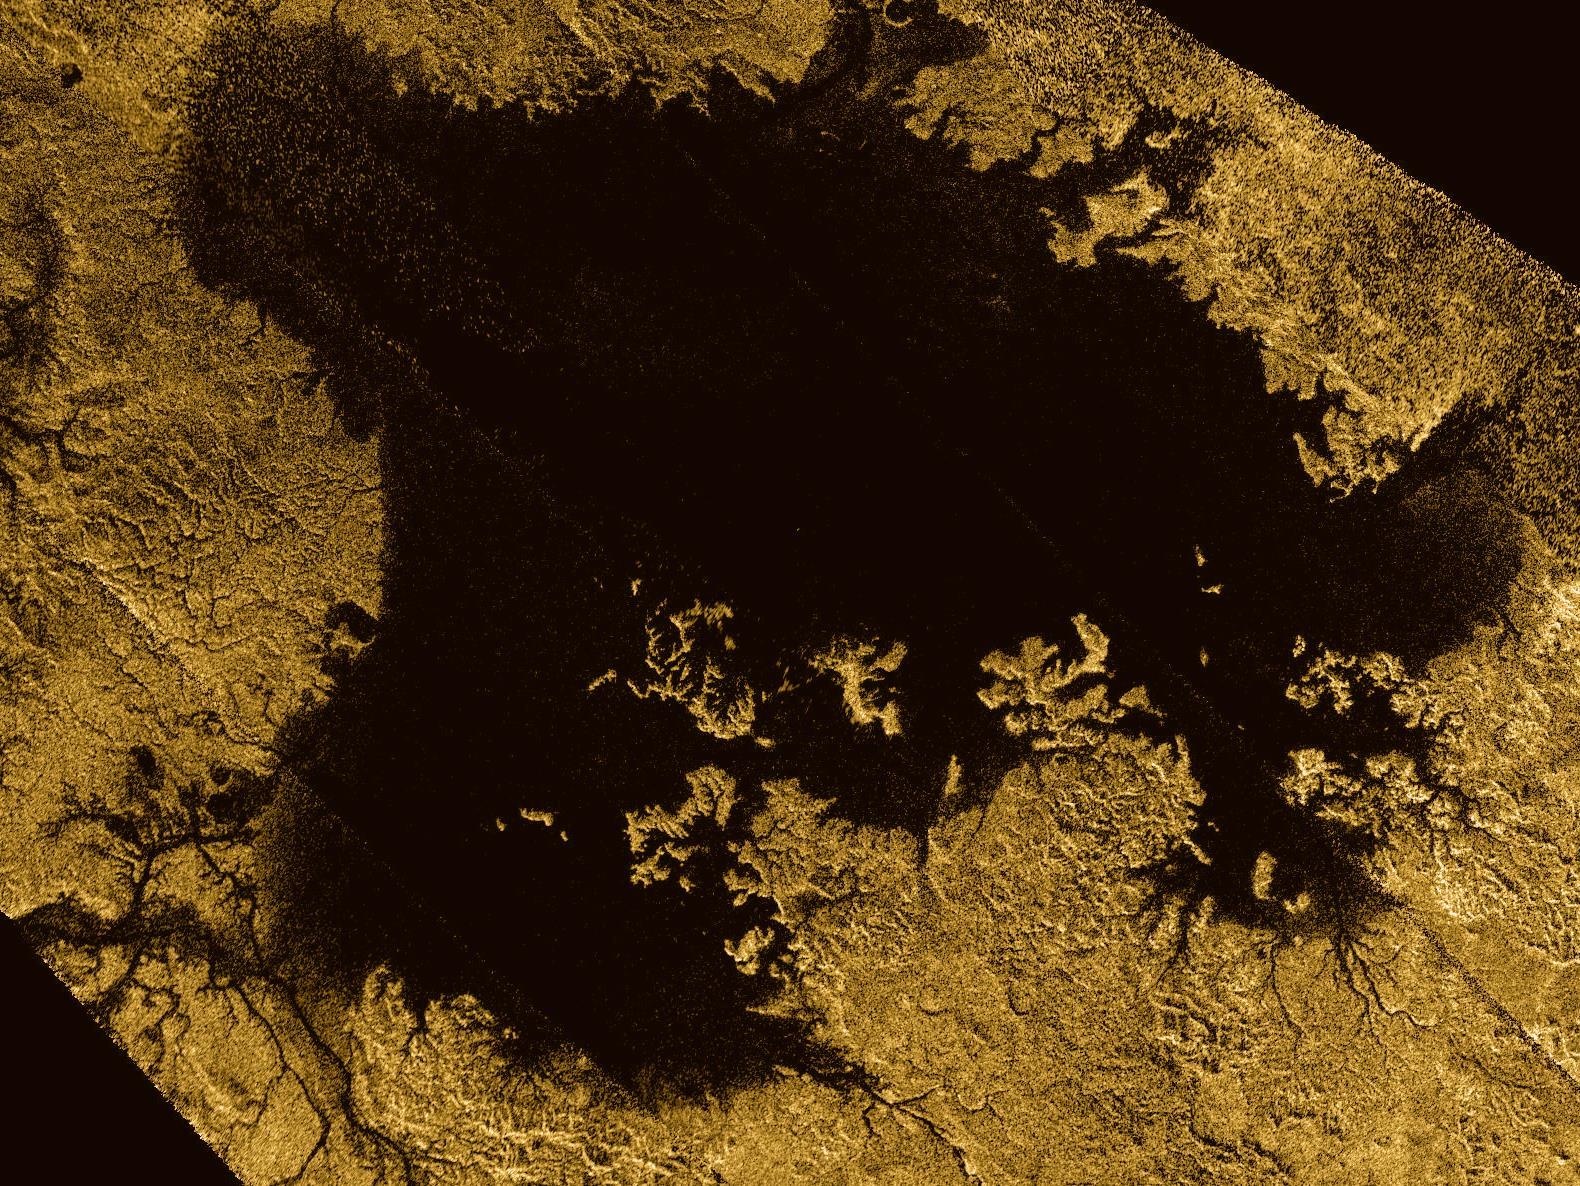 Image radar prise par Cassini montrant Ligeia Mare